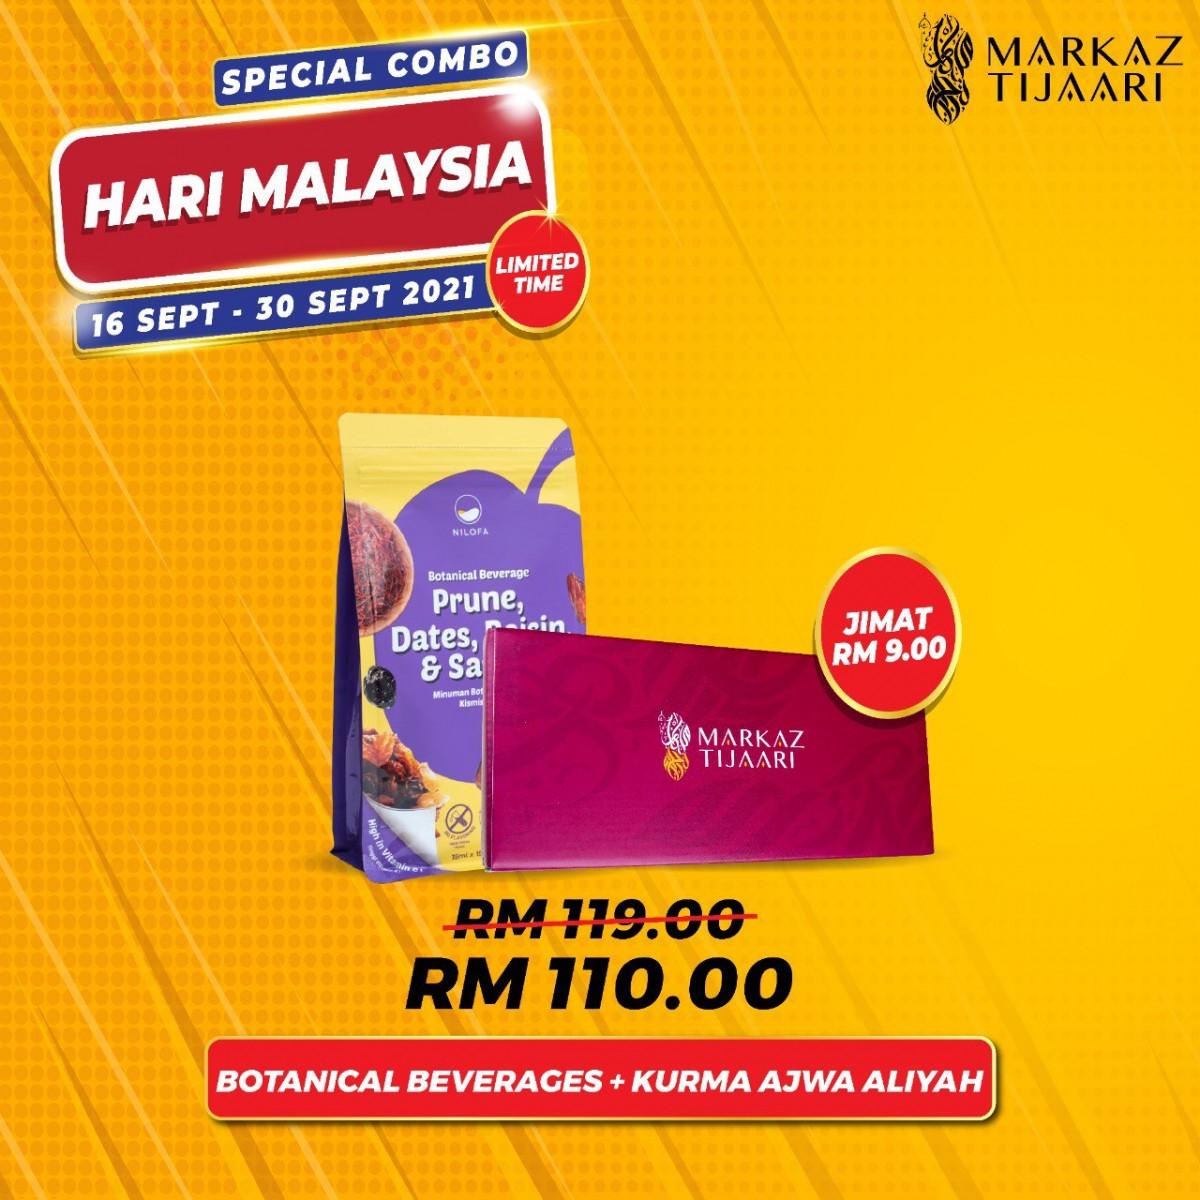 Malaysia Day Deals Botanical Beverage + Kurma Ajwa Aliyah - MARKAZ TIJAARI